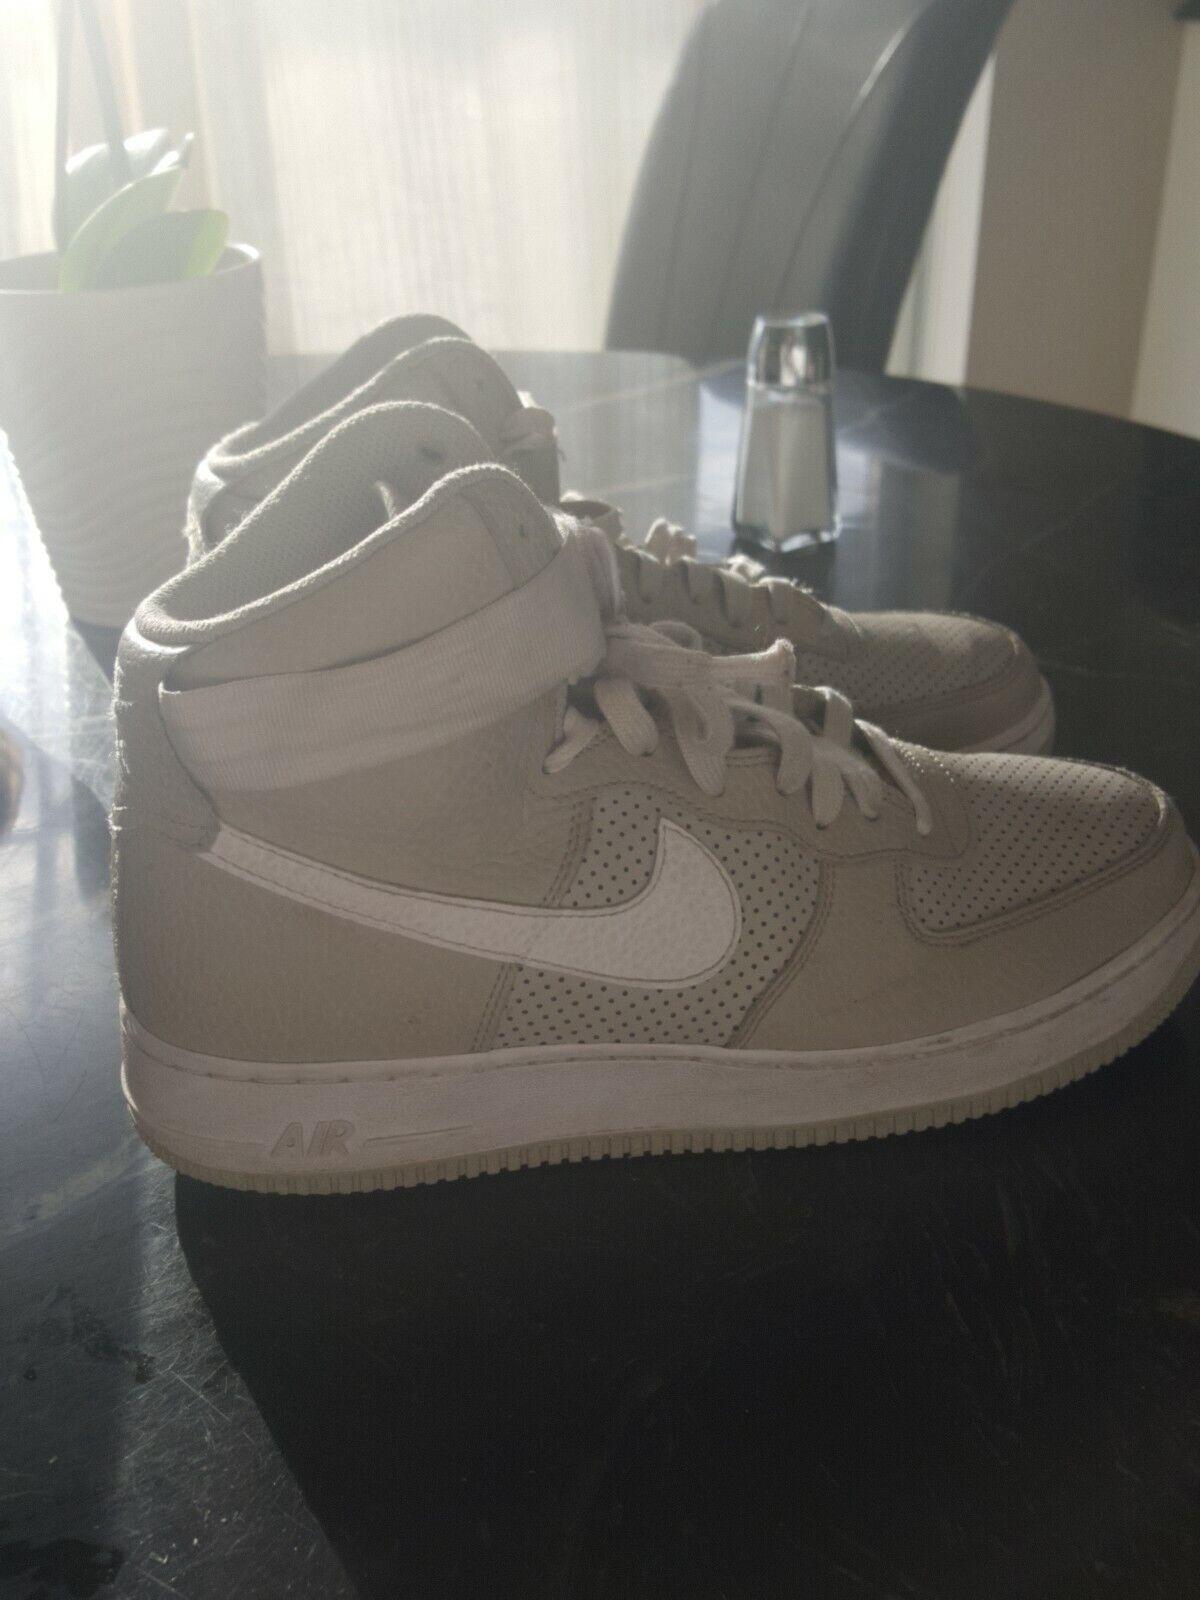 Nike Air Air Air Force 1 High Mens 315121-039 Pale Grey White Leather shoes Size 8.5 700ba7